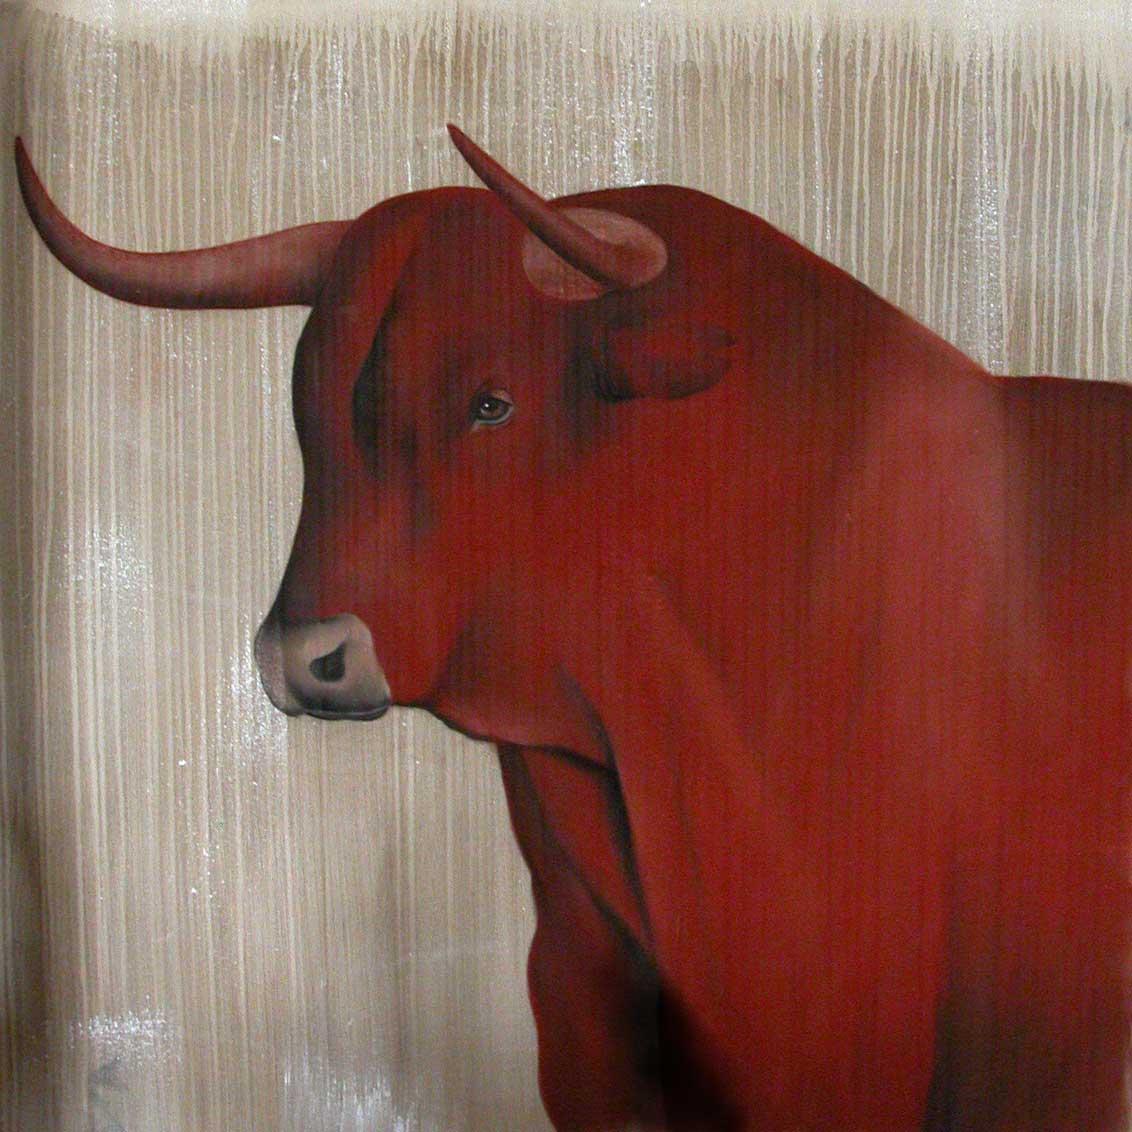 red bull 02 taureau rouge thierry bisch artiste peintre animaux esp ces menac es. Black Bedroom Furniture Sets. Home Design Ideas